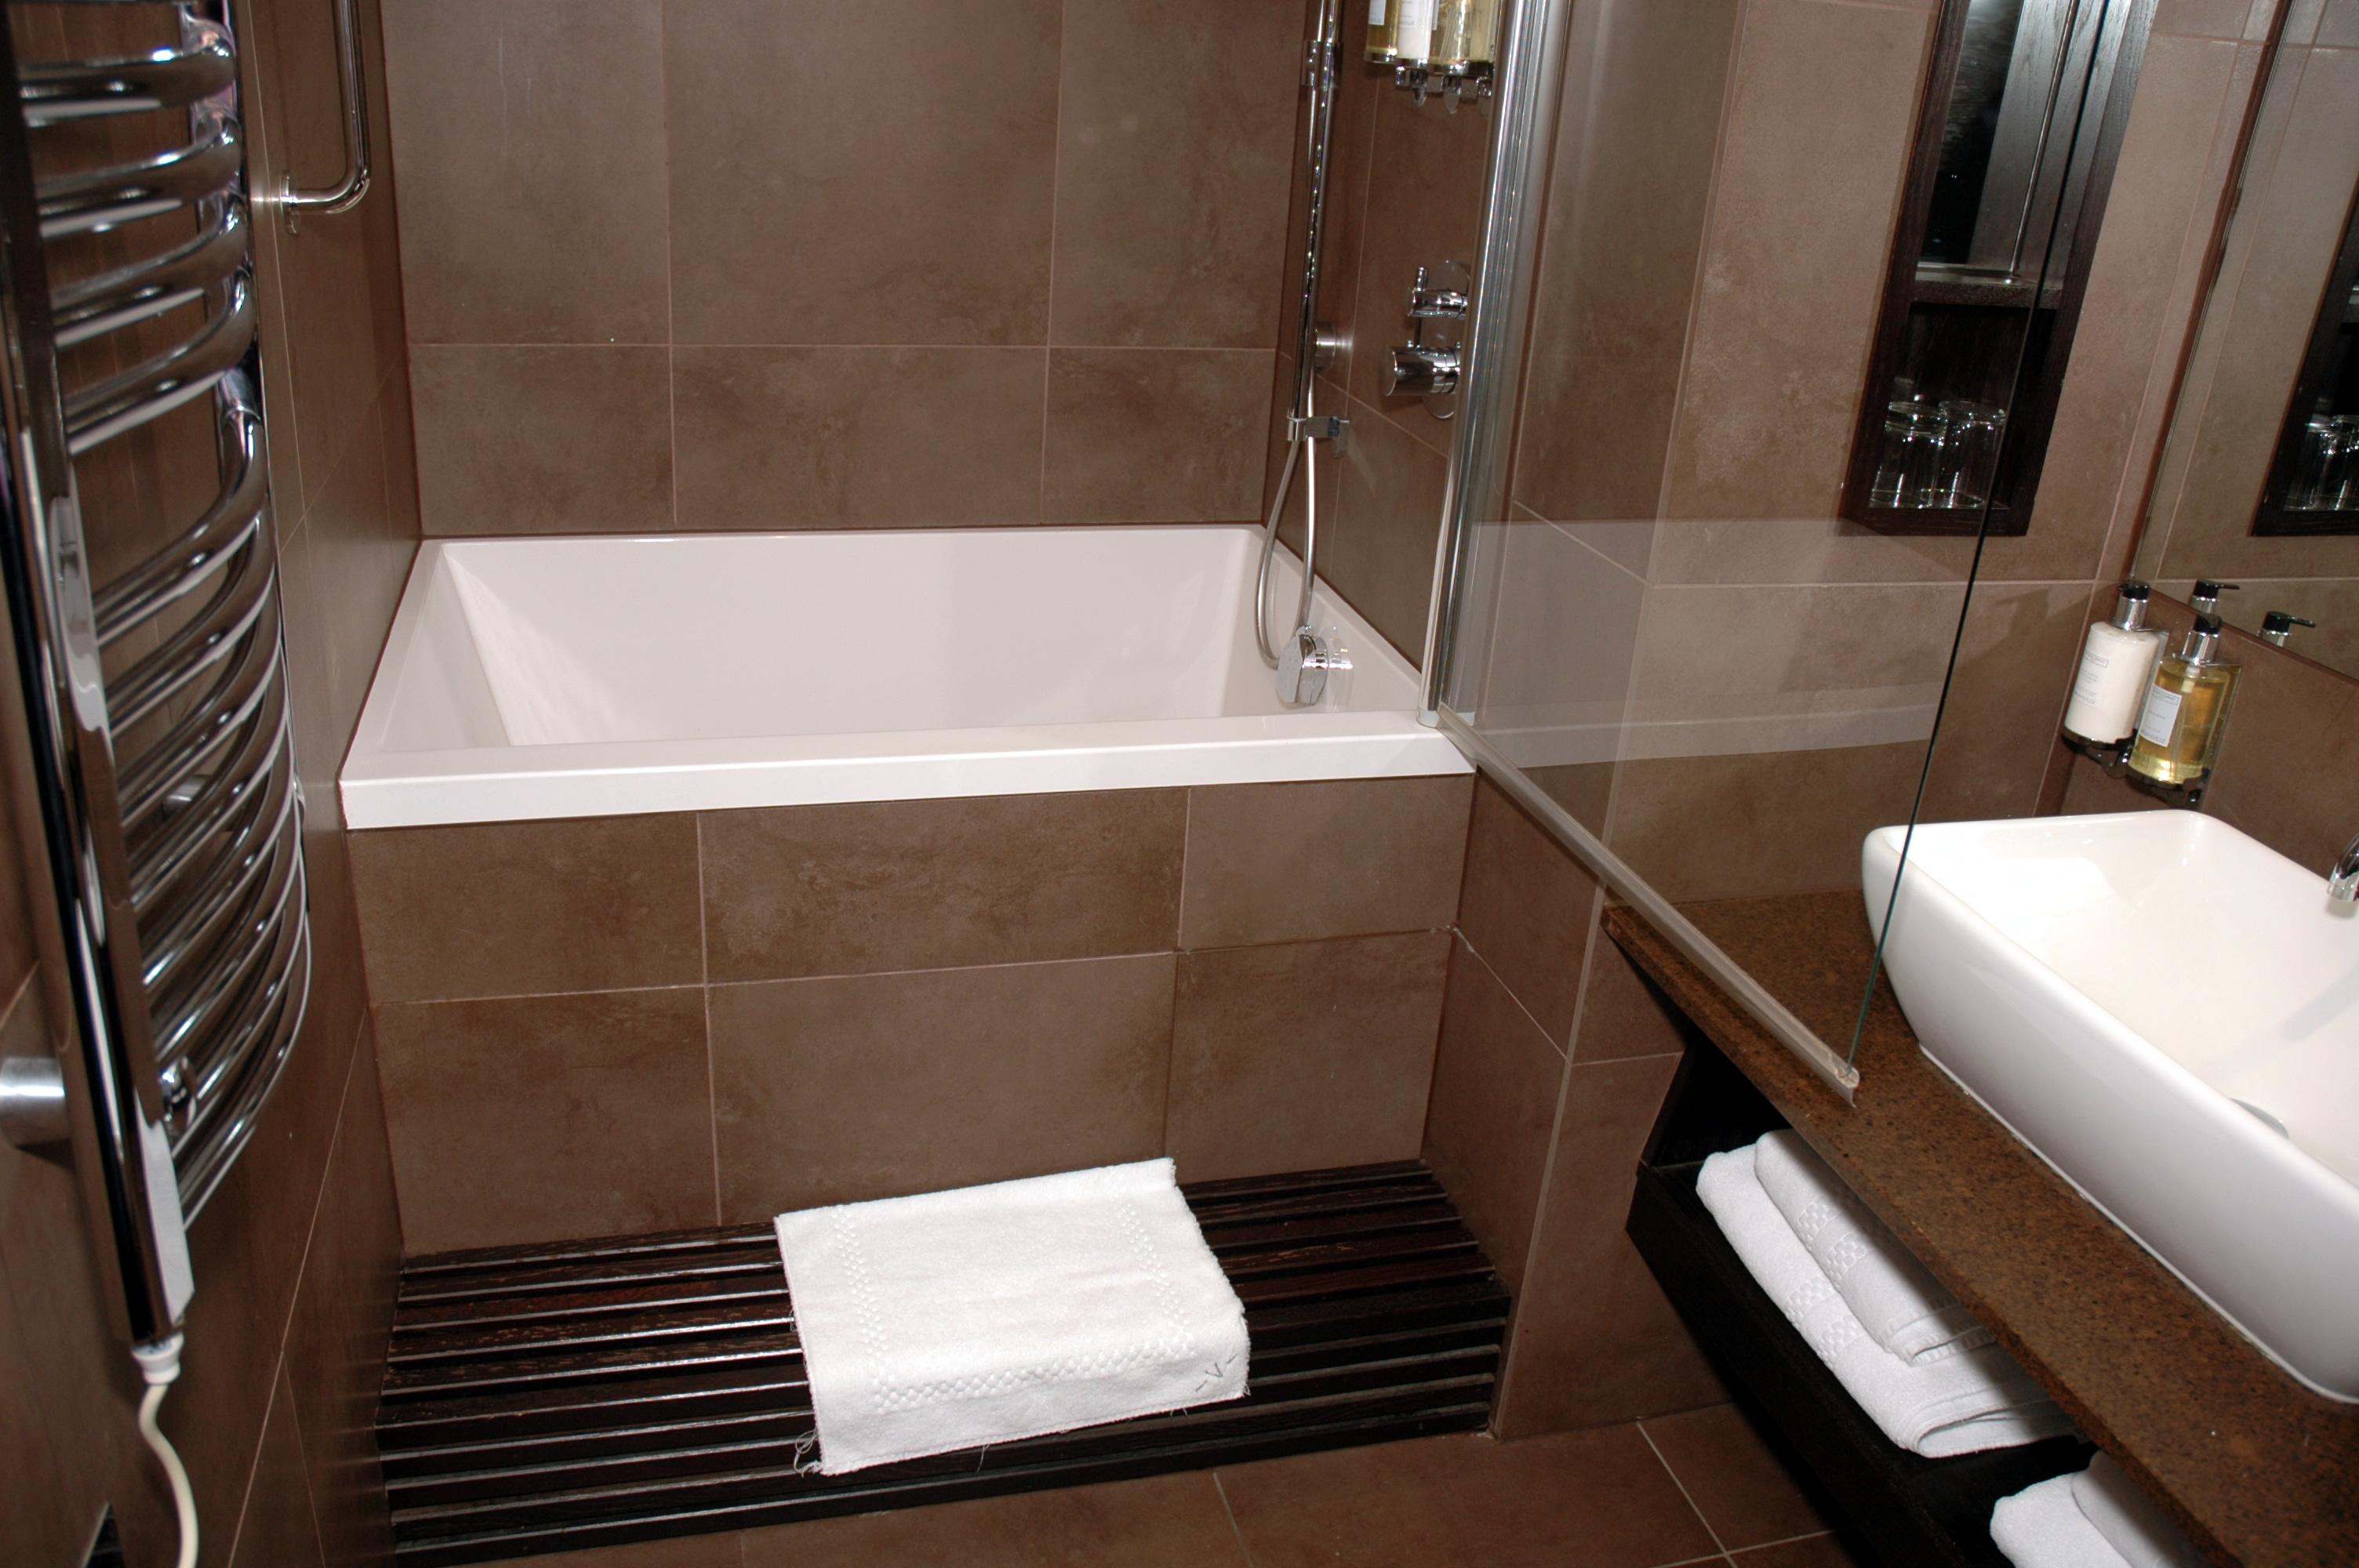 Deep Tub Awith Stainless Steel Faucet Unit Black Metal Built Steps Hang Kit